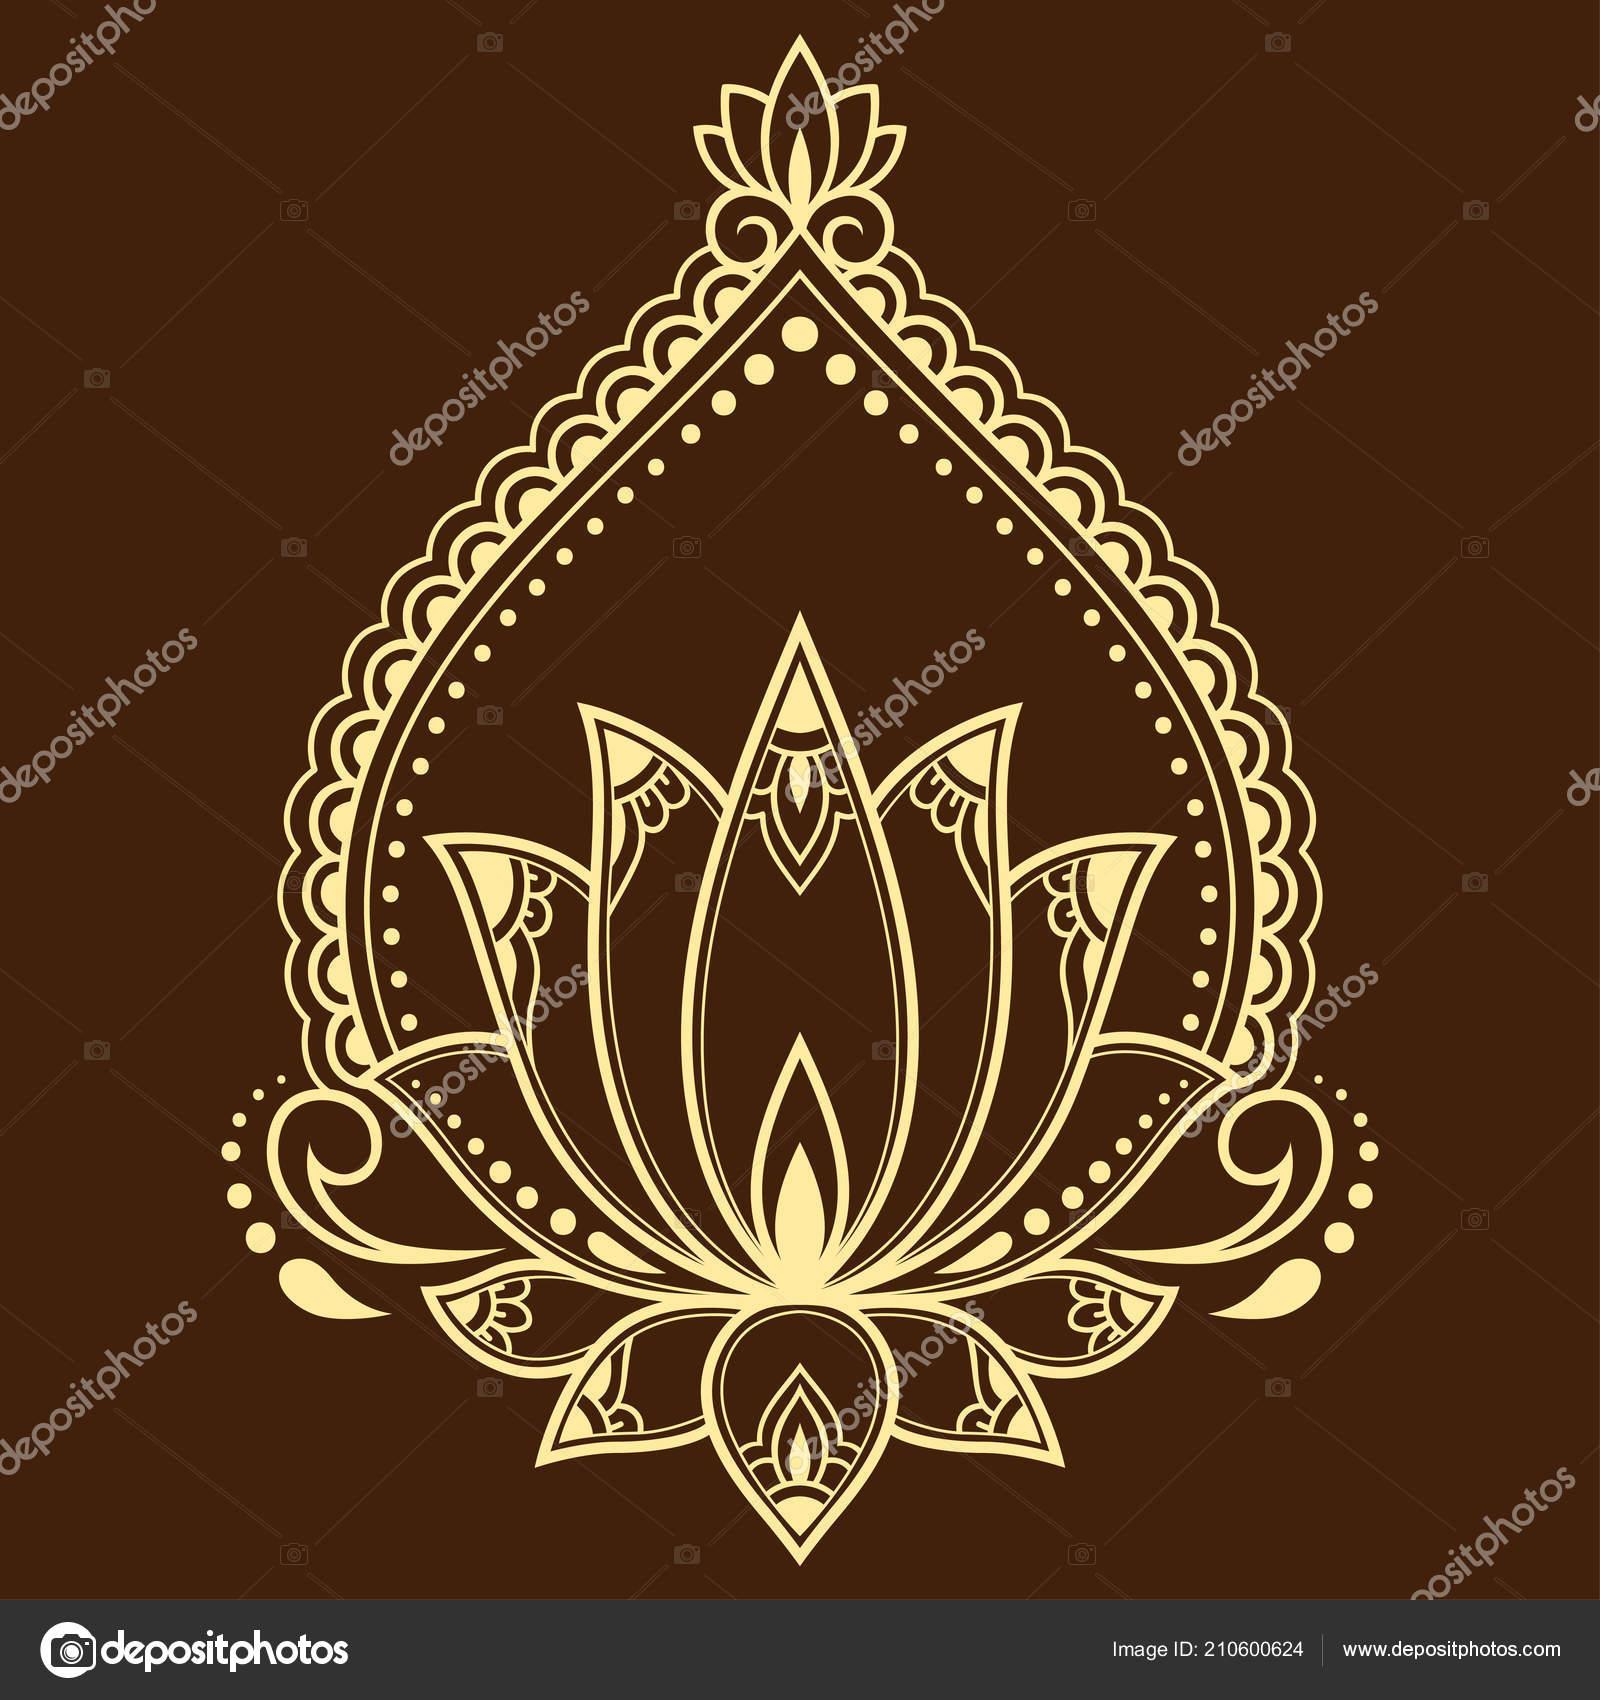 Mehndi Lotus Flower Pattern Henna Drawing Tattoo Decoration Ethnic